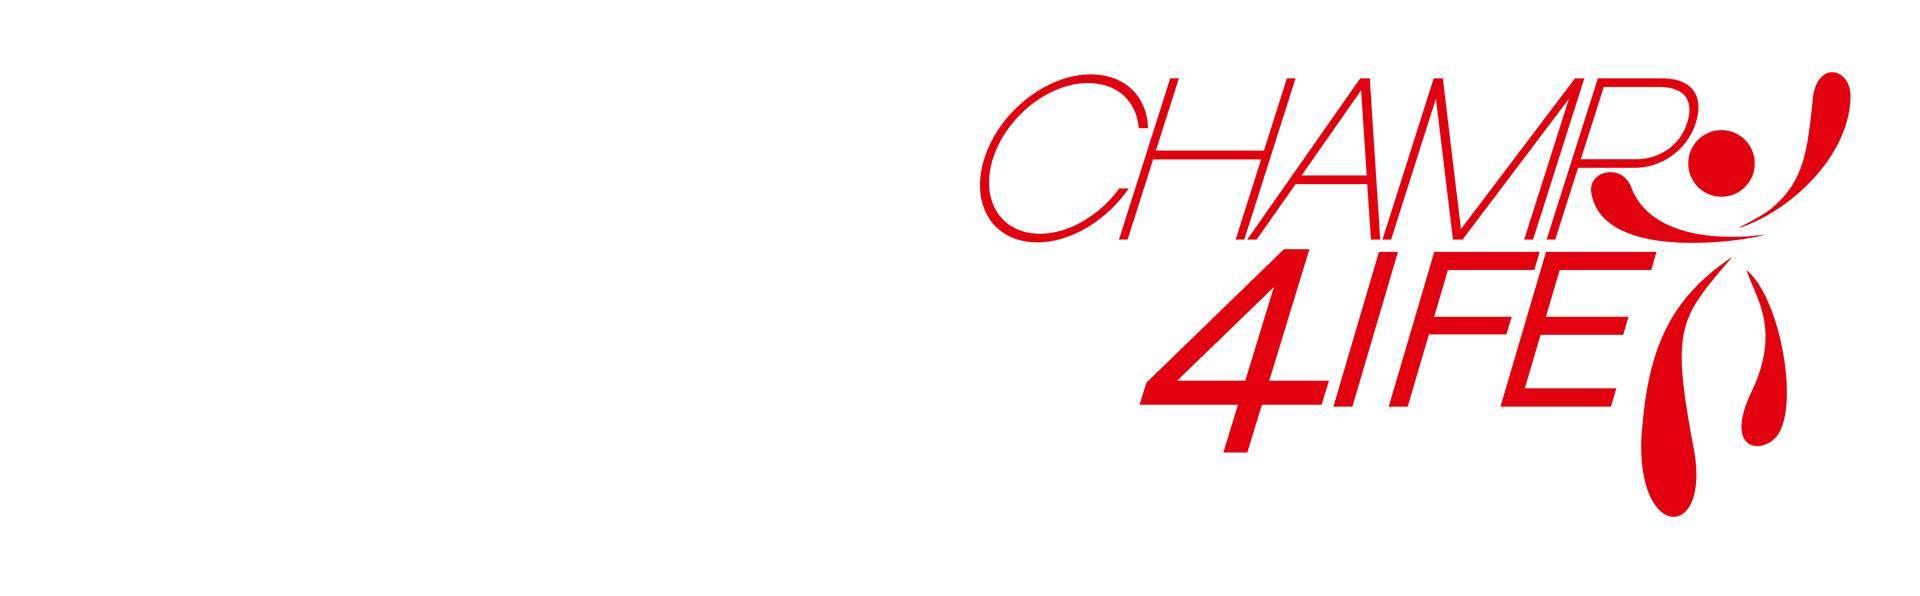 chmaps4life